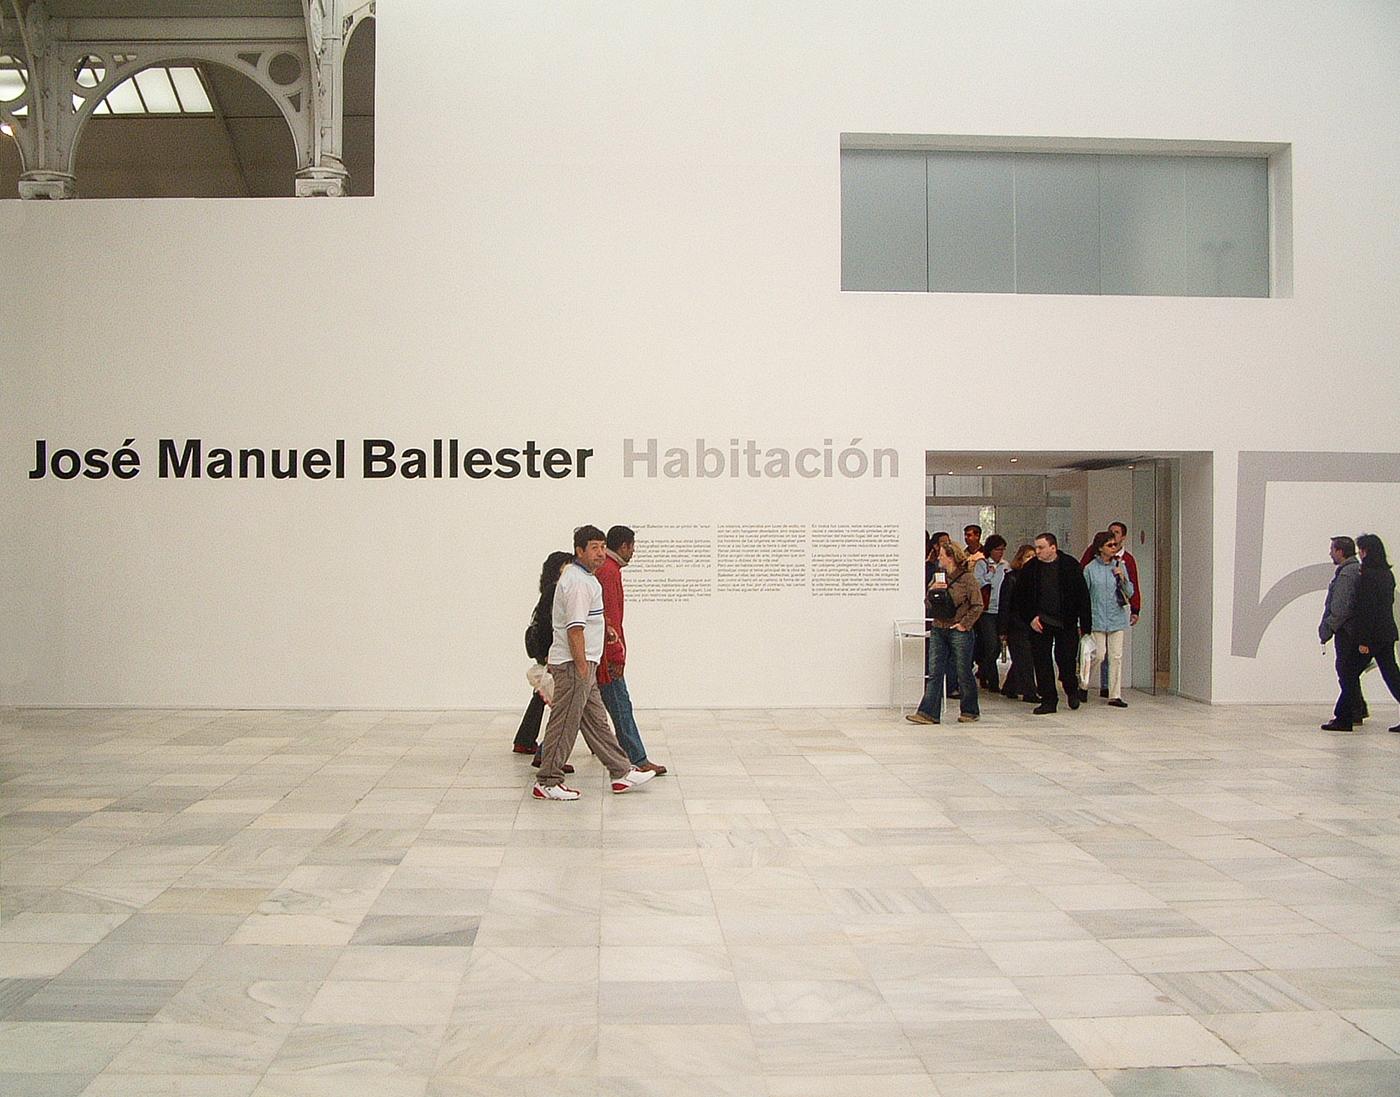 Jos manuel ballester habitaci n 523 on behance - Jose manuel ballester ...